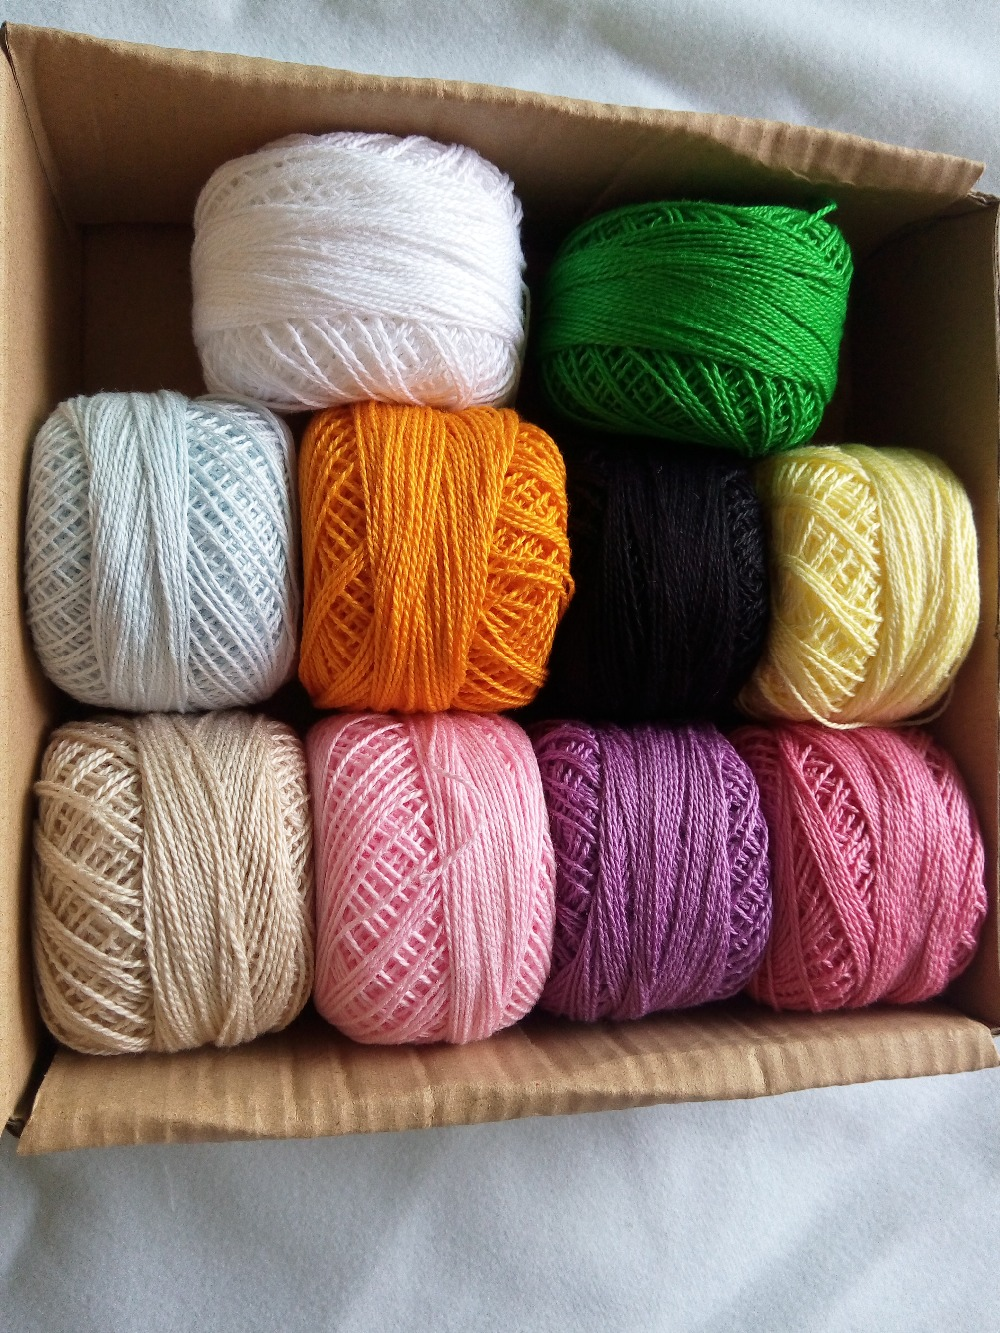 Dark Violet Embroidery 10 gm Cross Stitch 6 Strand Ply Cotton Thread Yarn